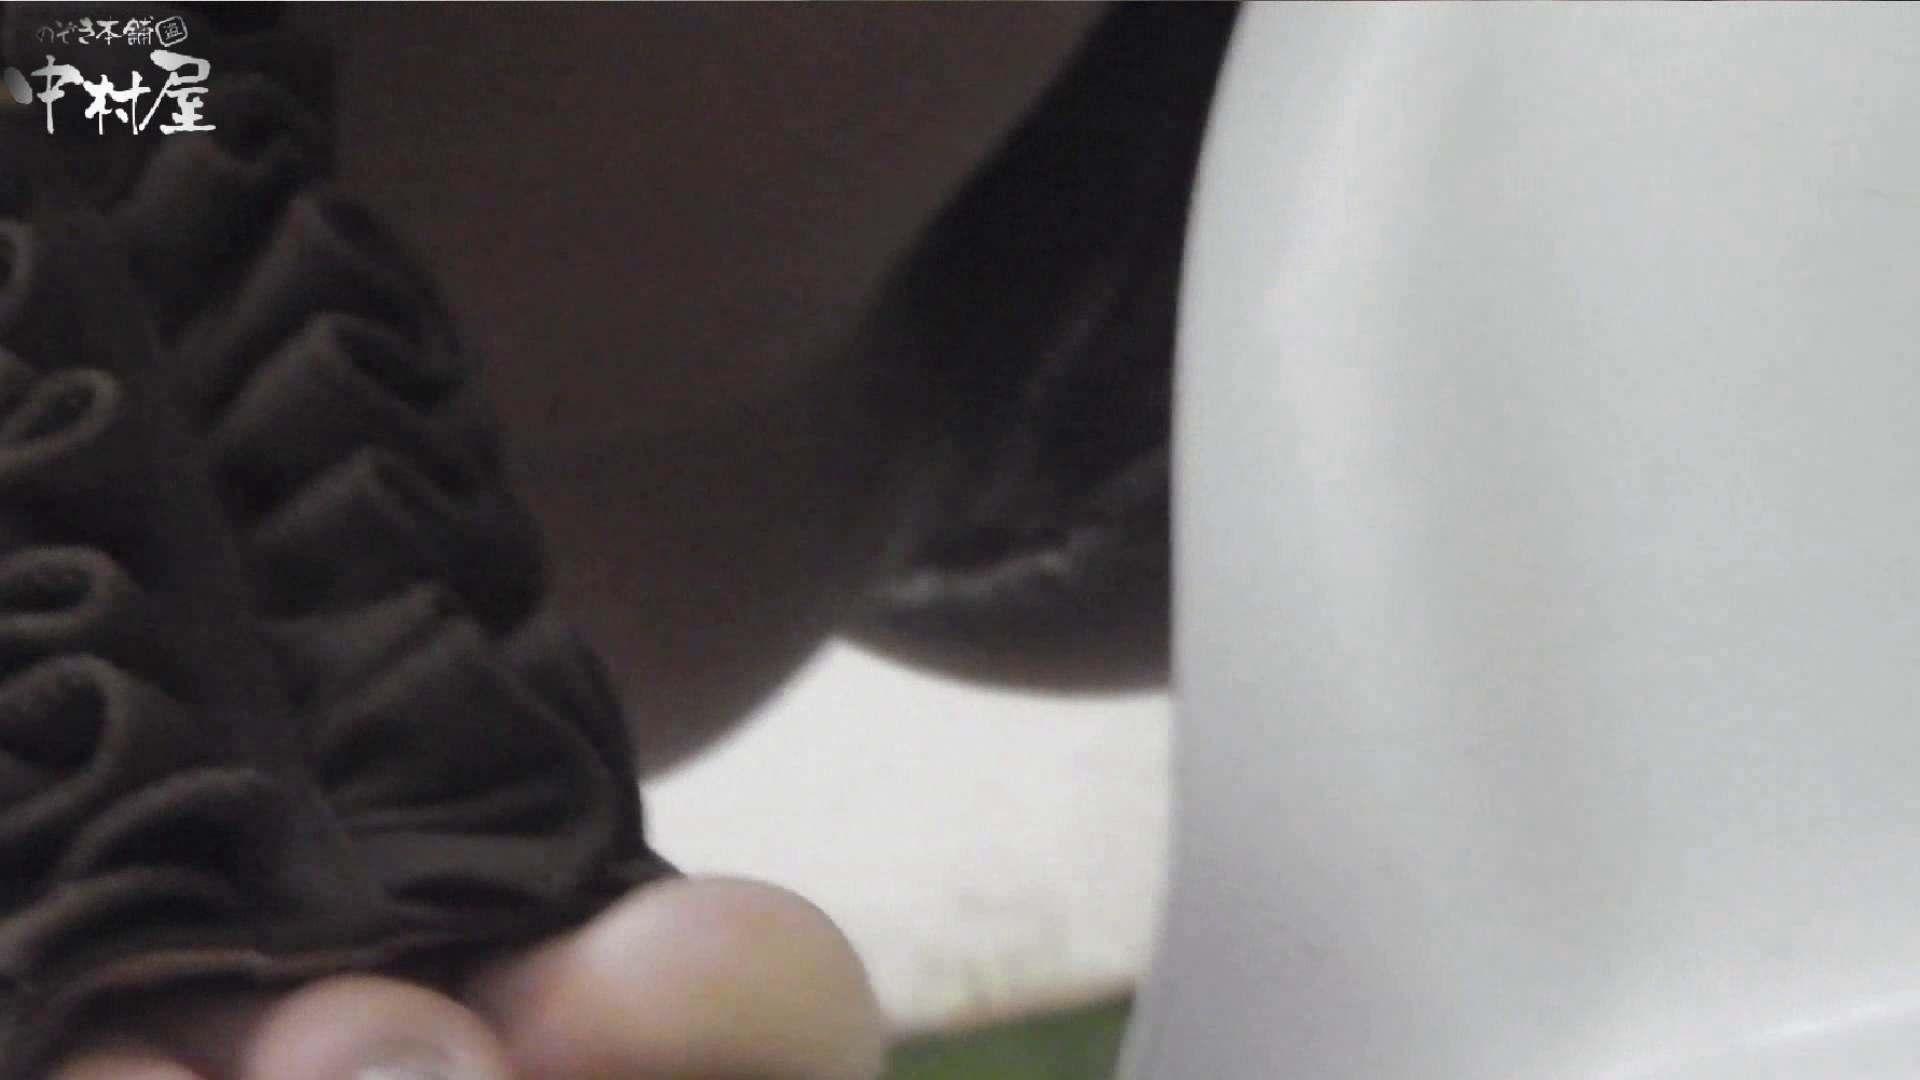 vol.38 命がけ潜伏洗面所! 巨乳さん・固め・推定200g 巨乳 覗きスケベ動画紹介 56画像 18